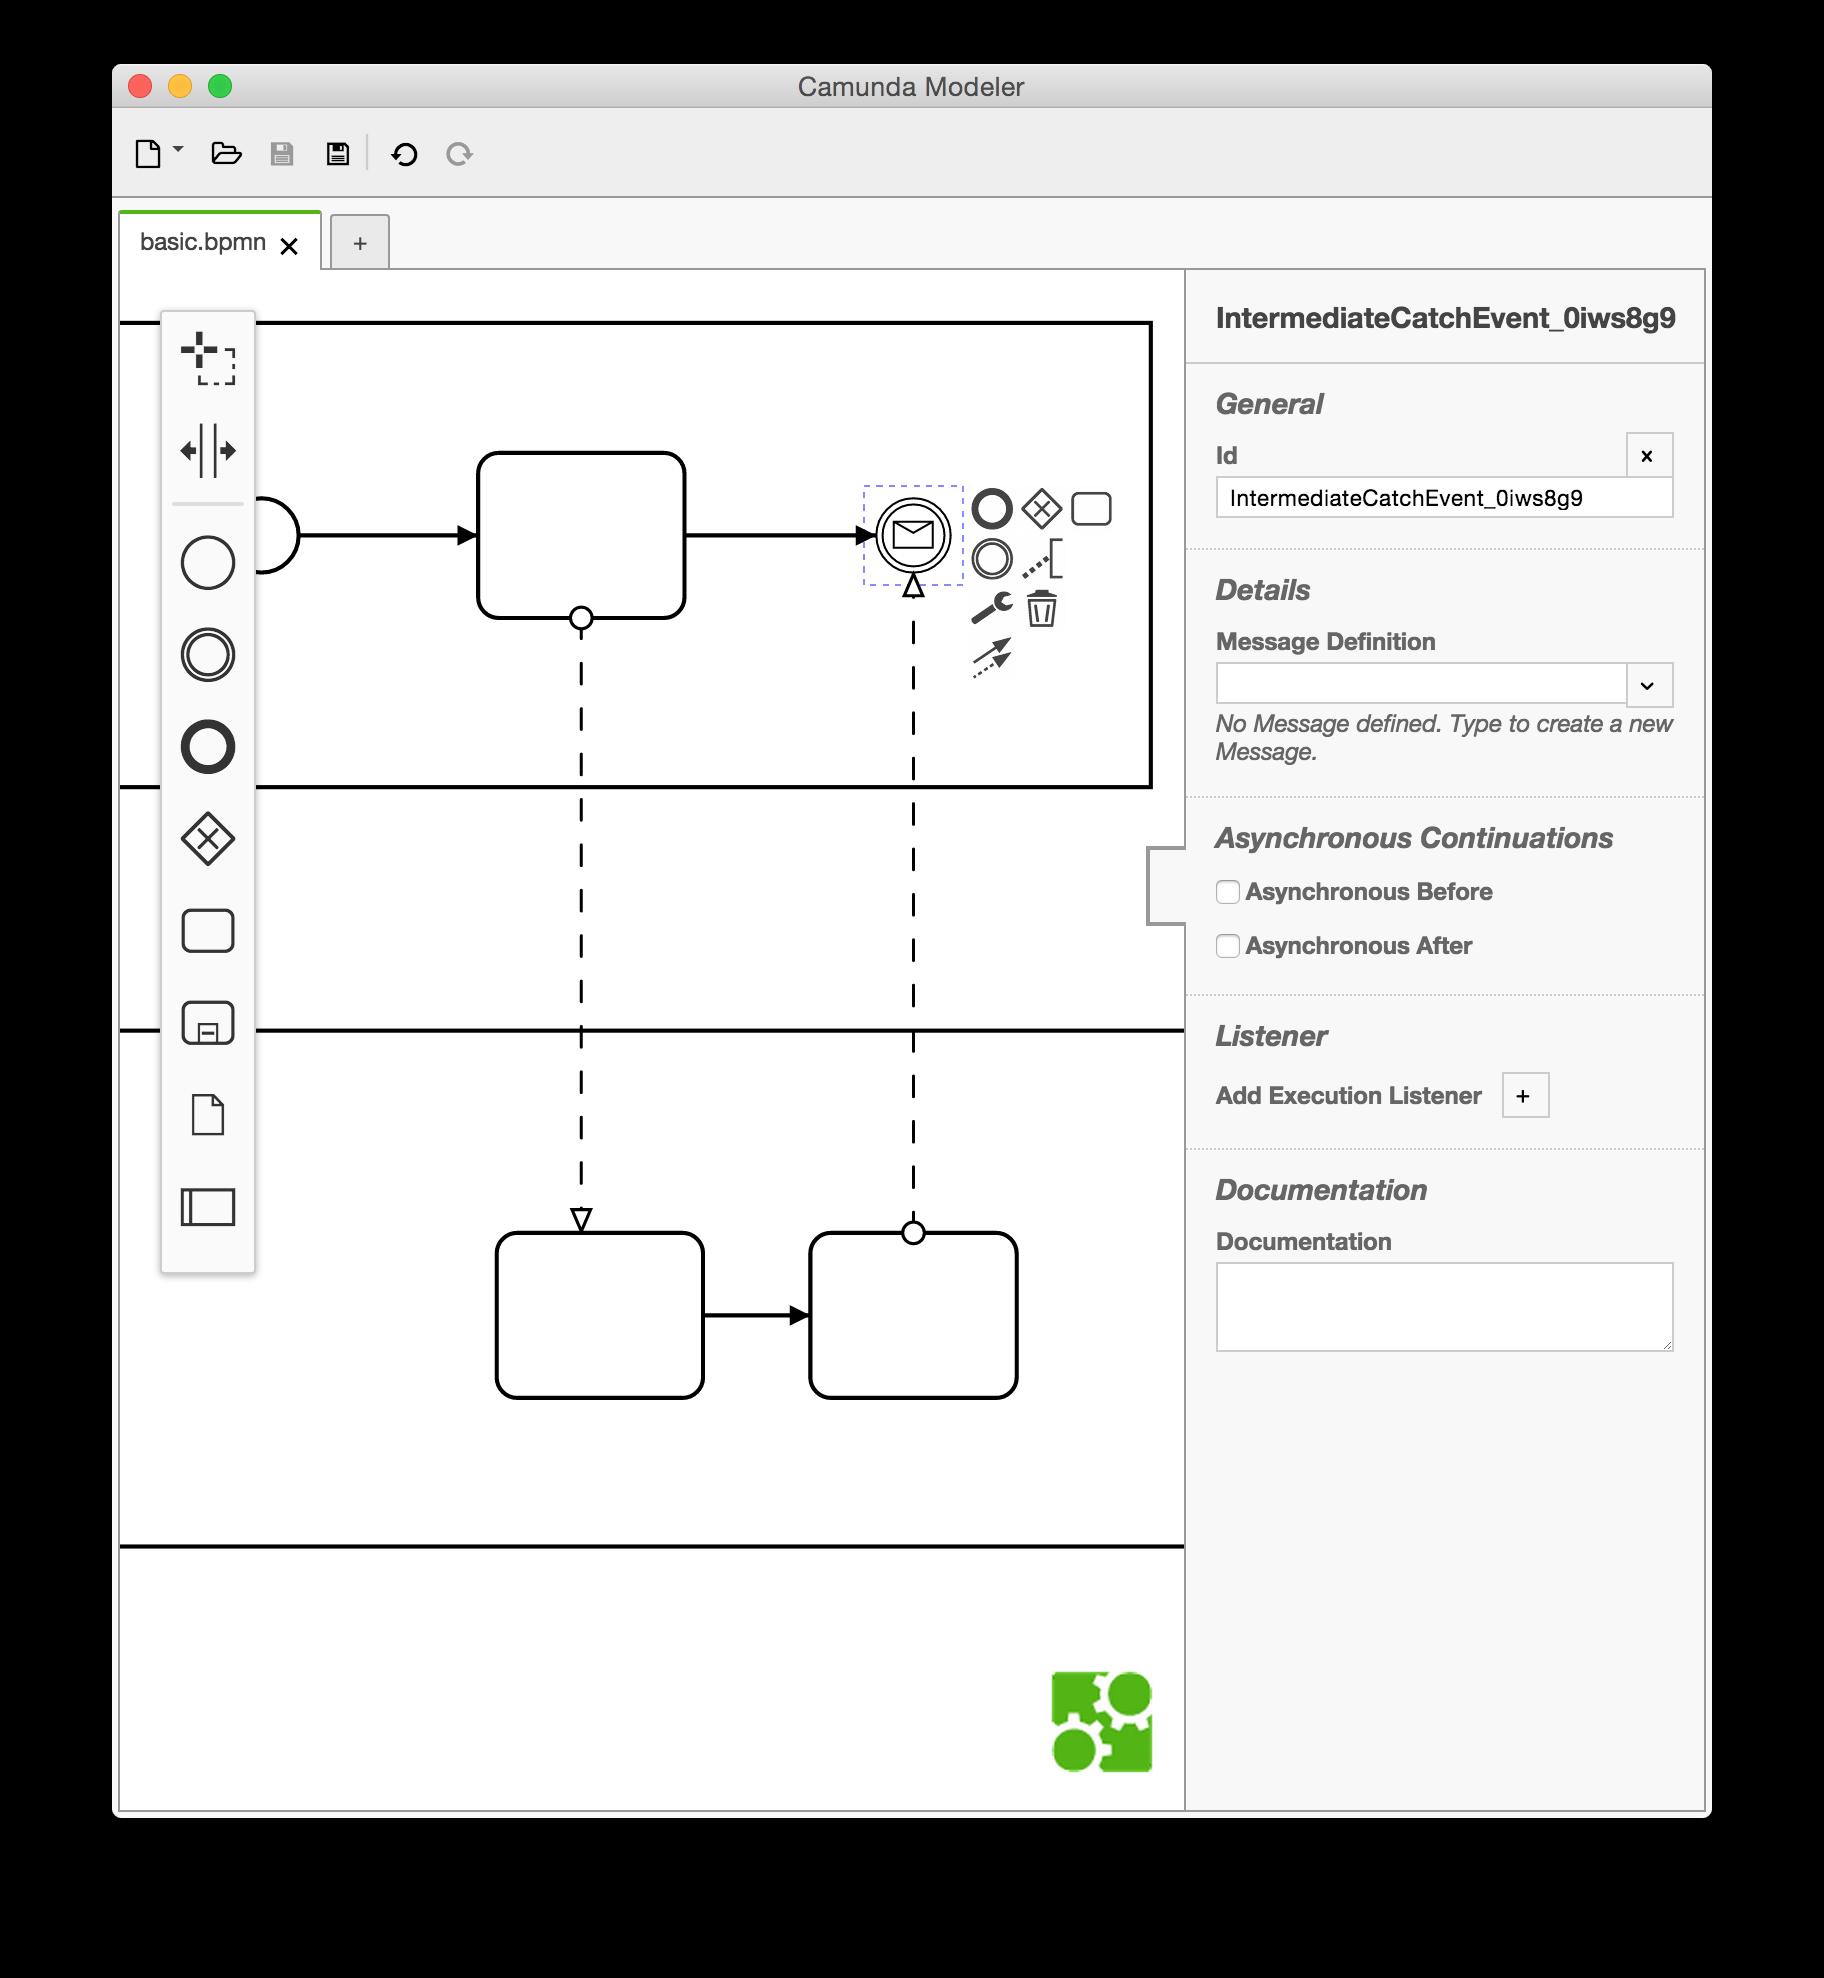 https://camunda.org/assets/img/camunda-modeler/overview-bpmn-properties-panel.png